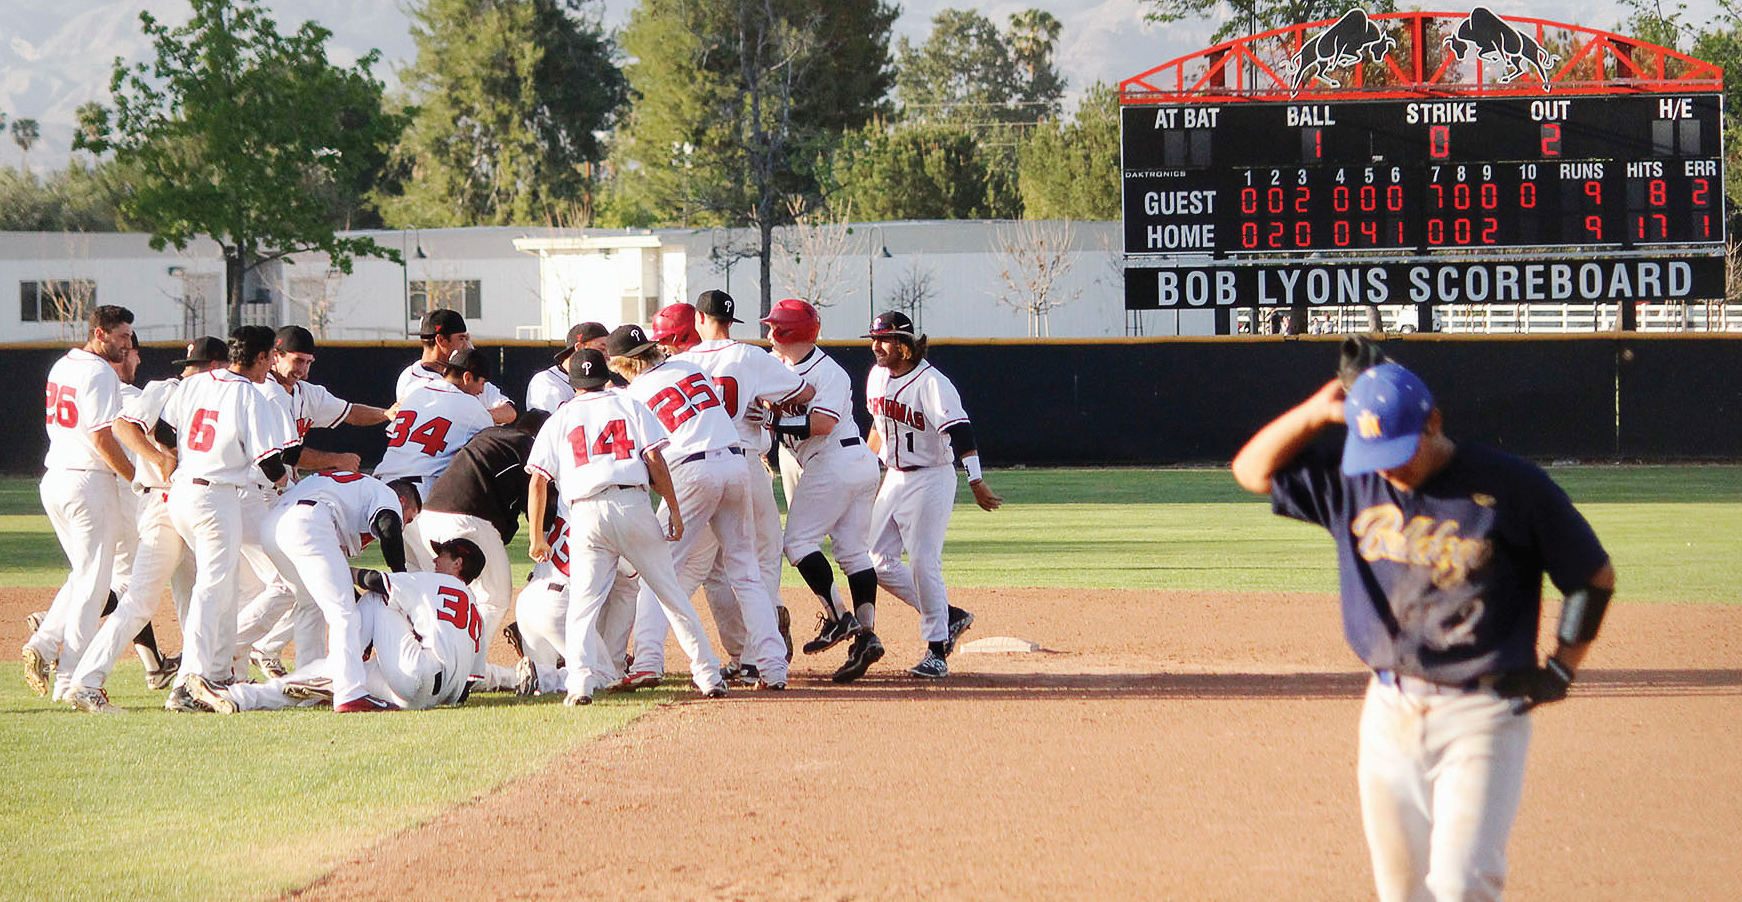 Late game heroics give Pierce baseball home victory